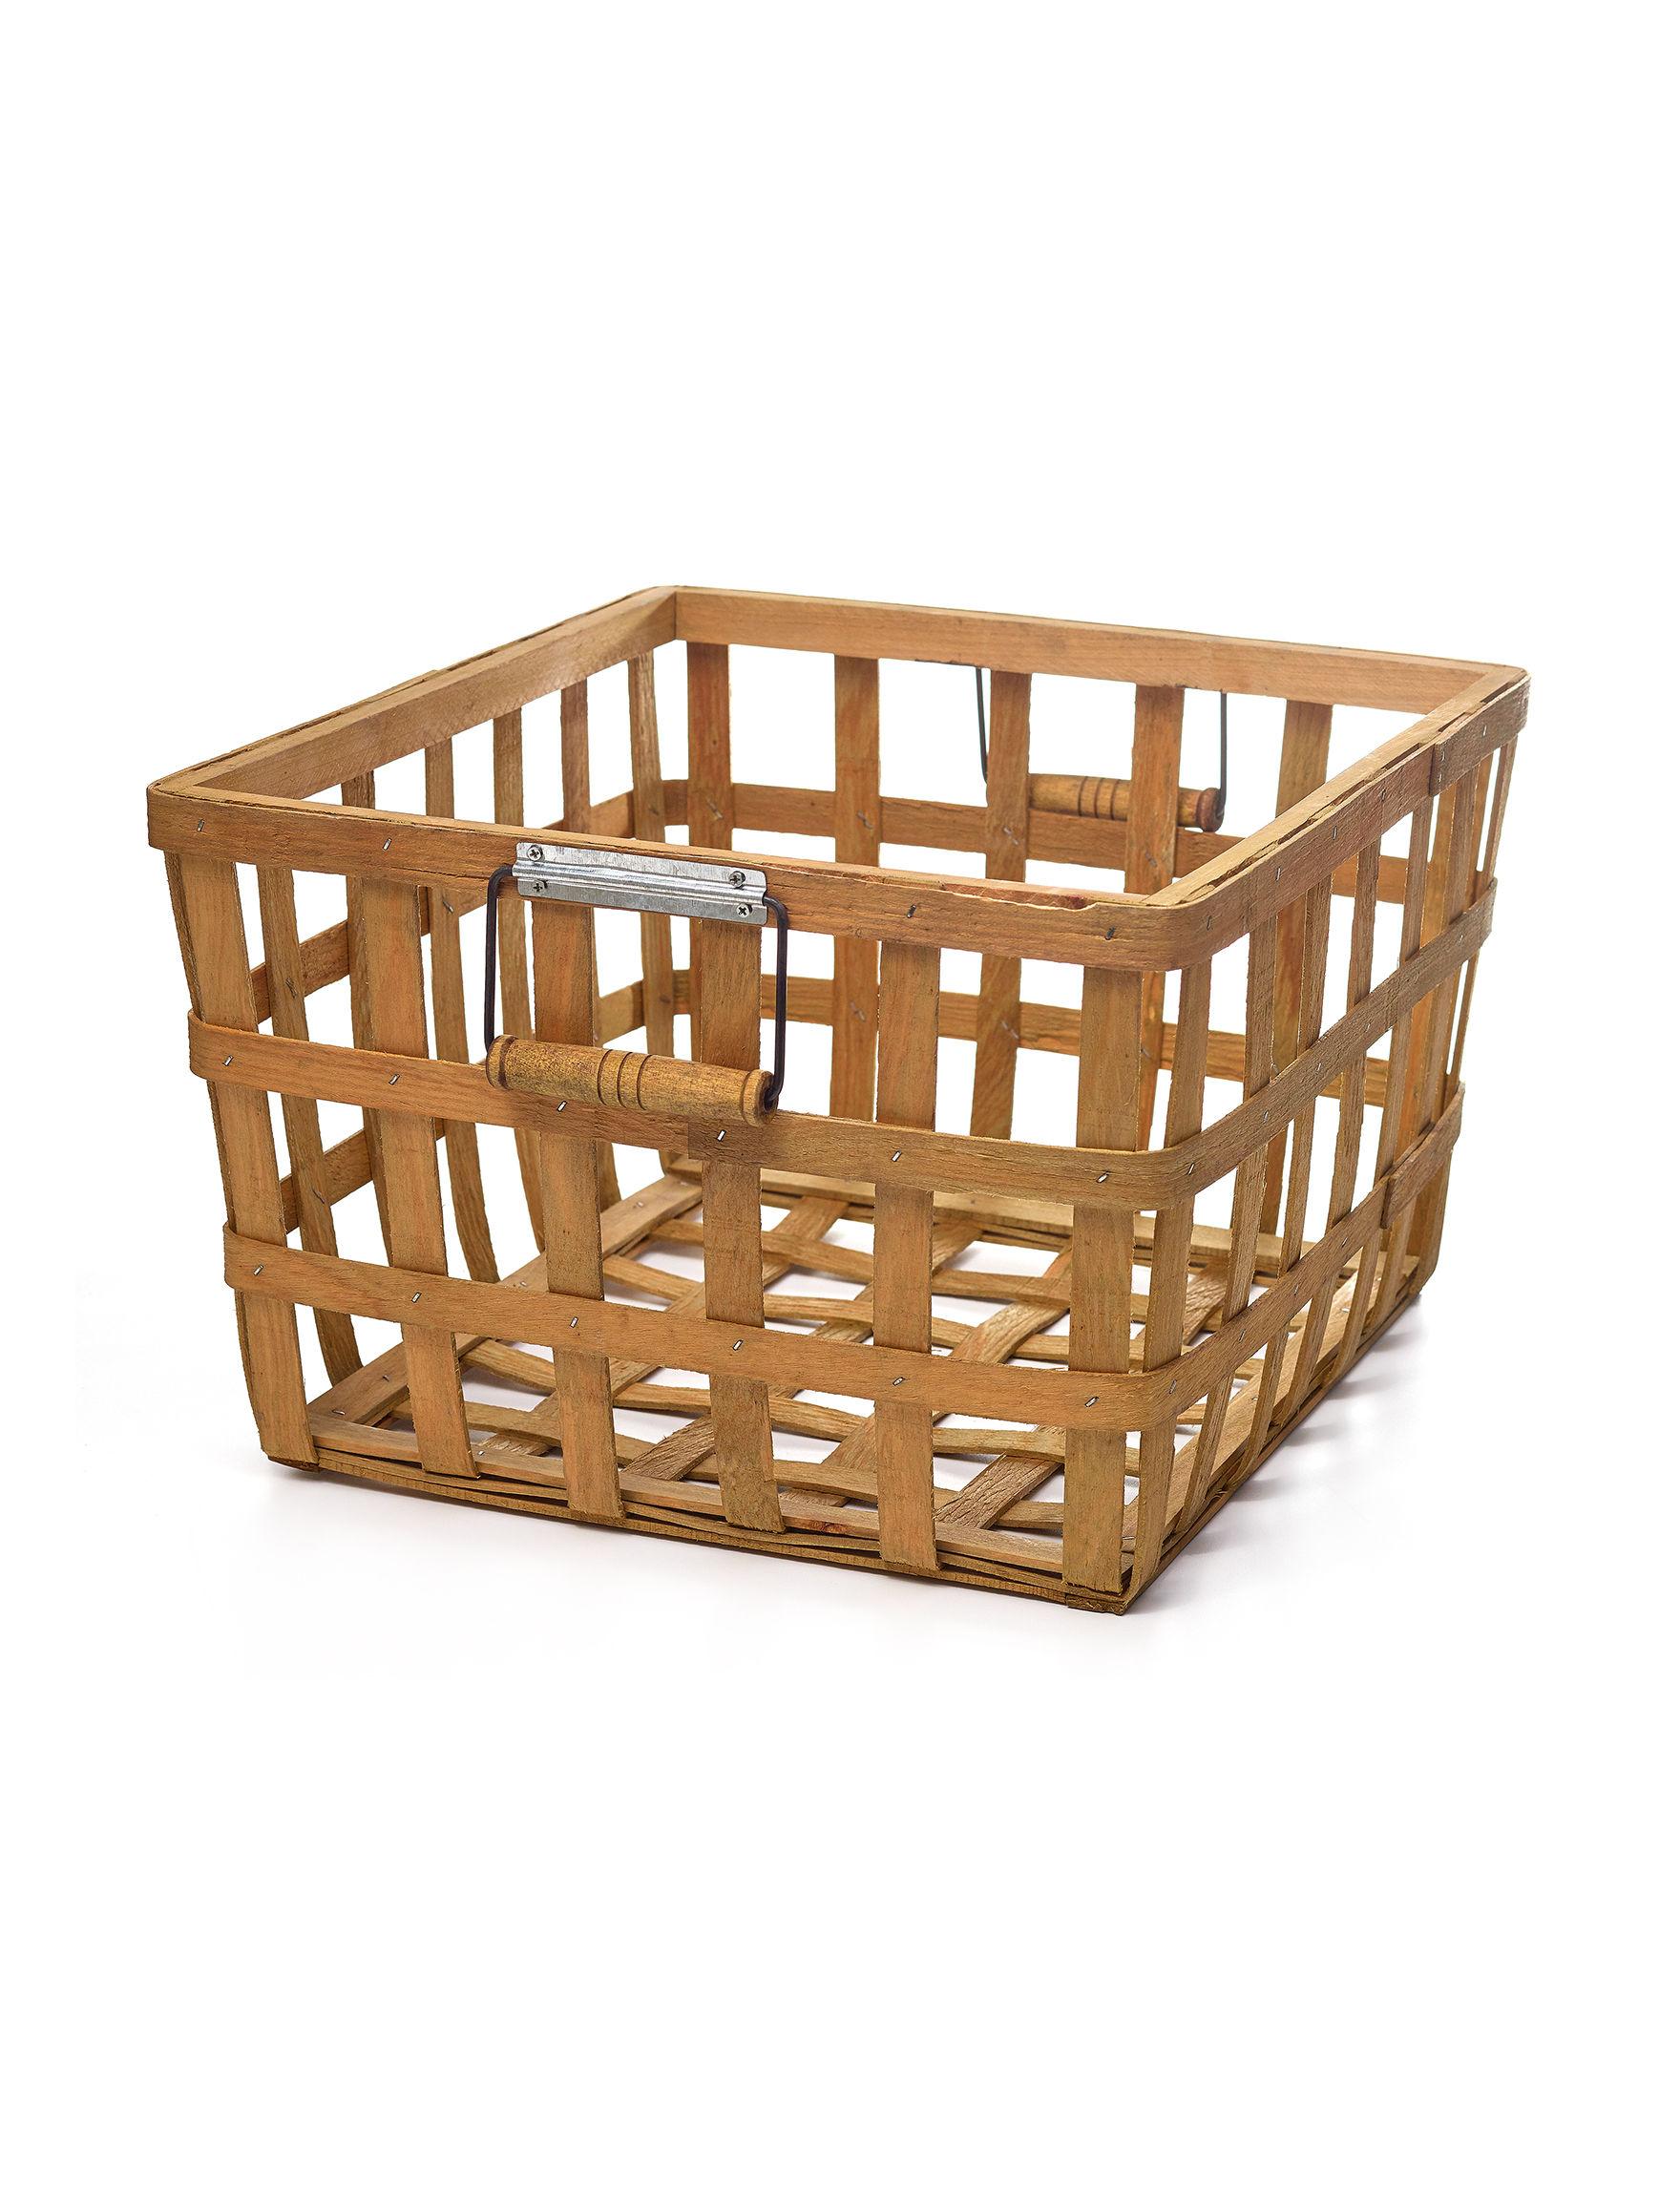 Enchante Wood Baskets Home Accents Storage & Organization